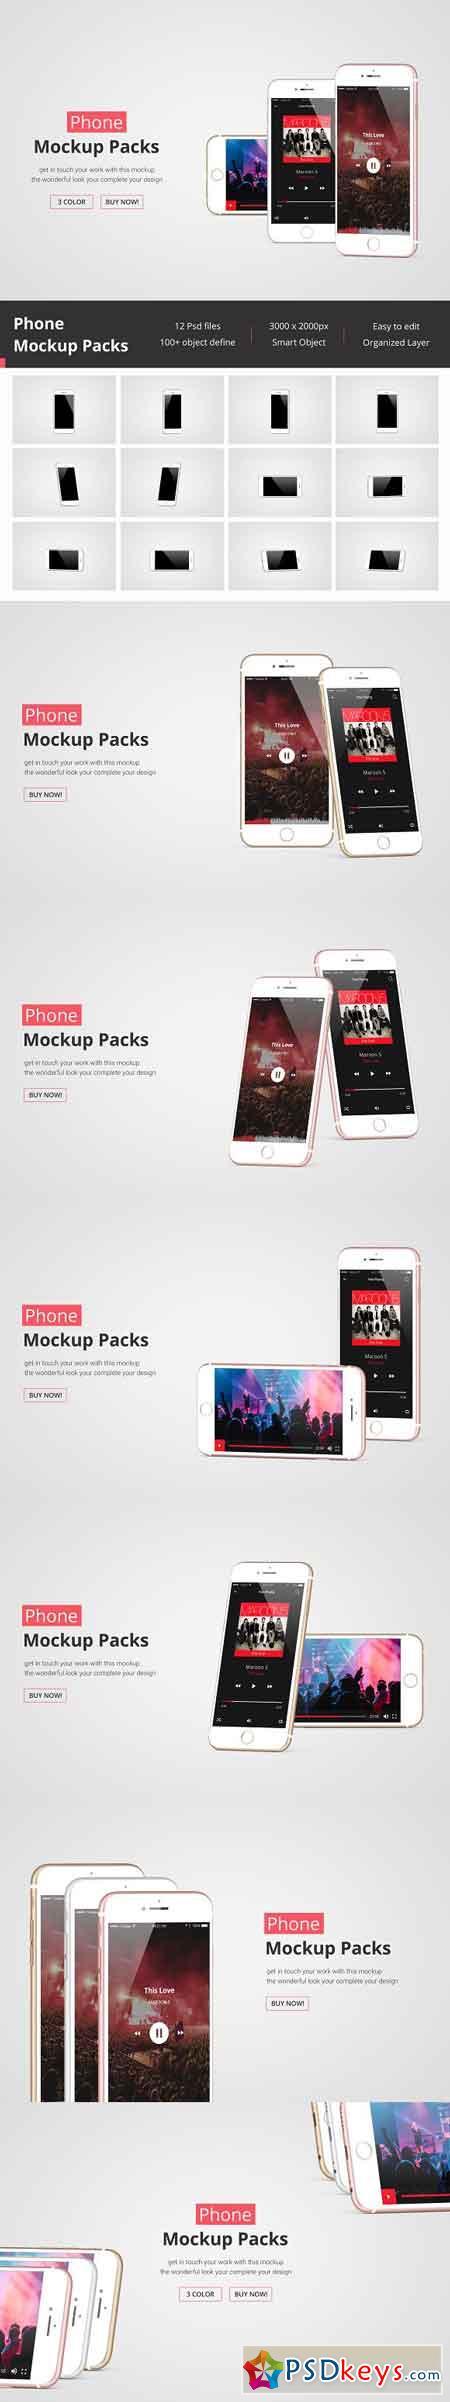 packs » Free Download Photoshop Vector Stock image Via Torrent